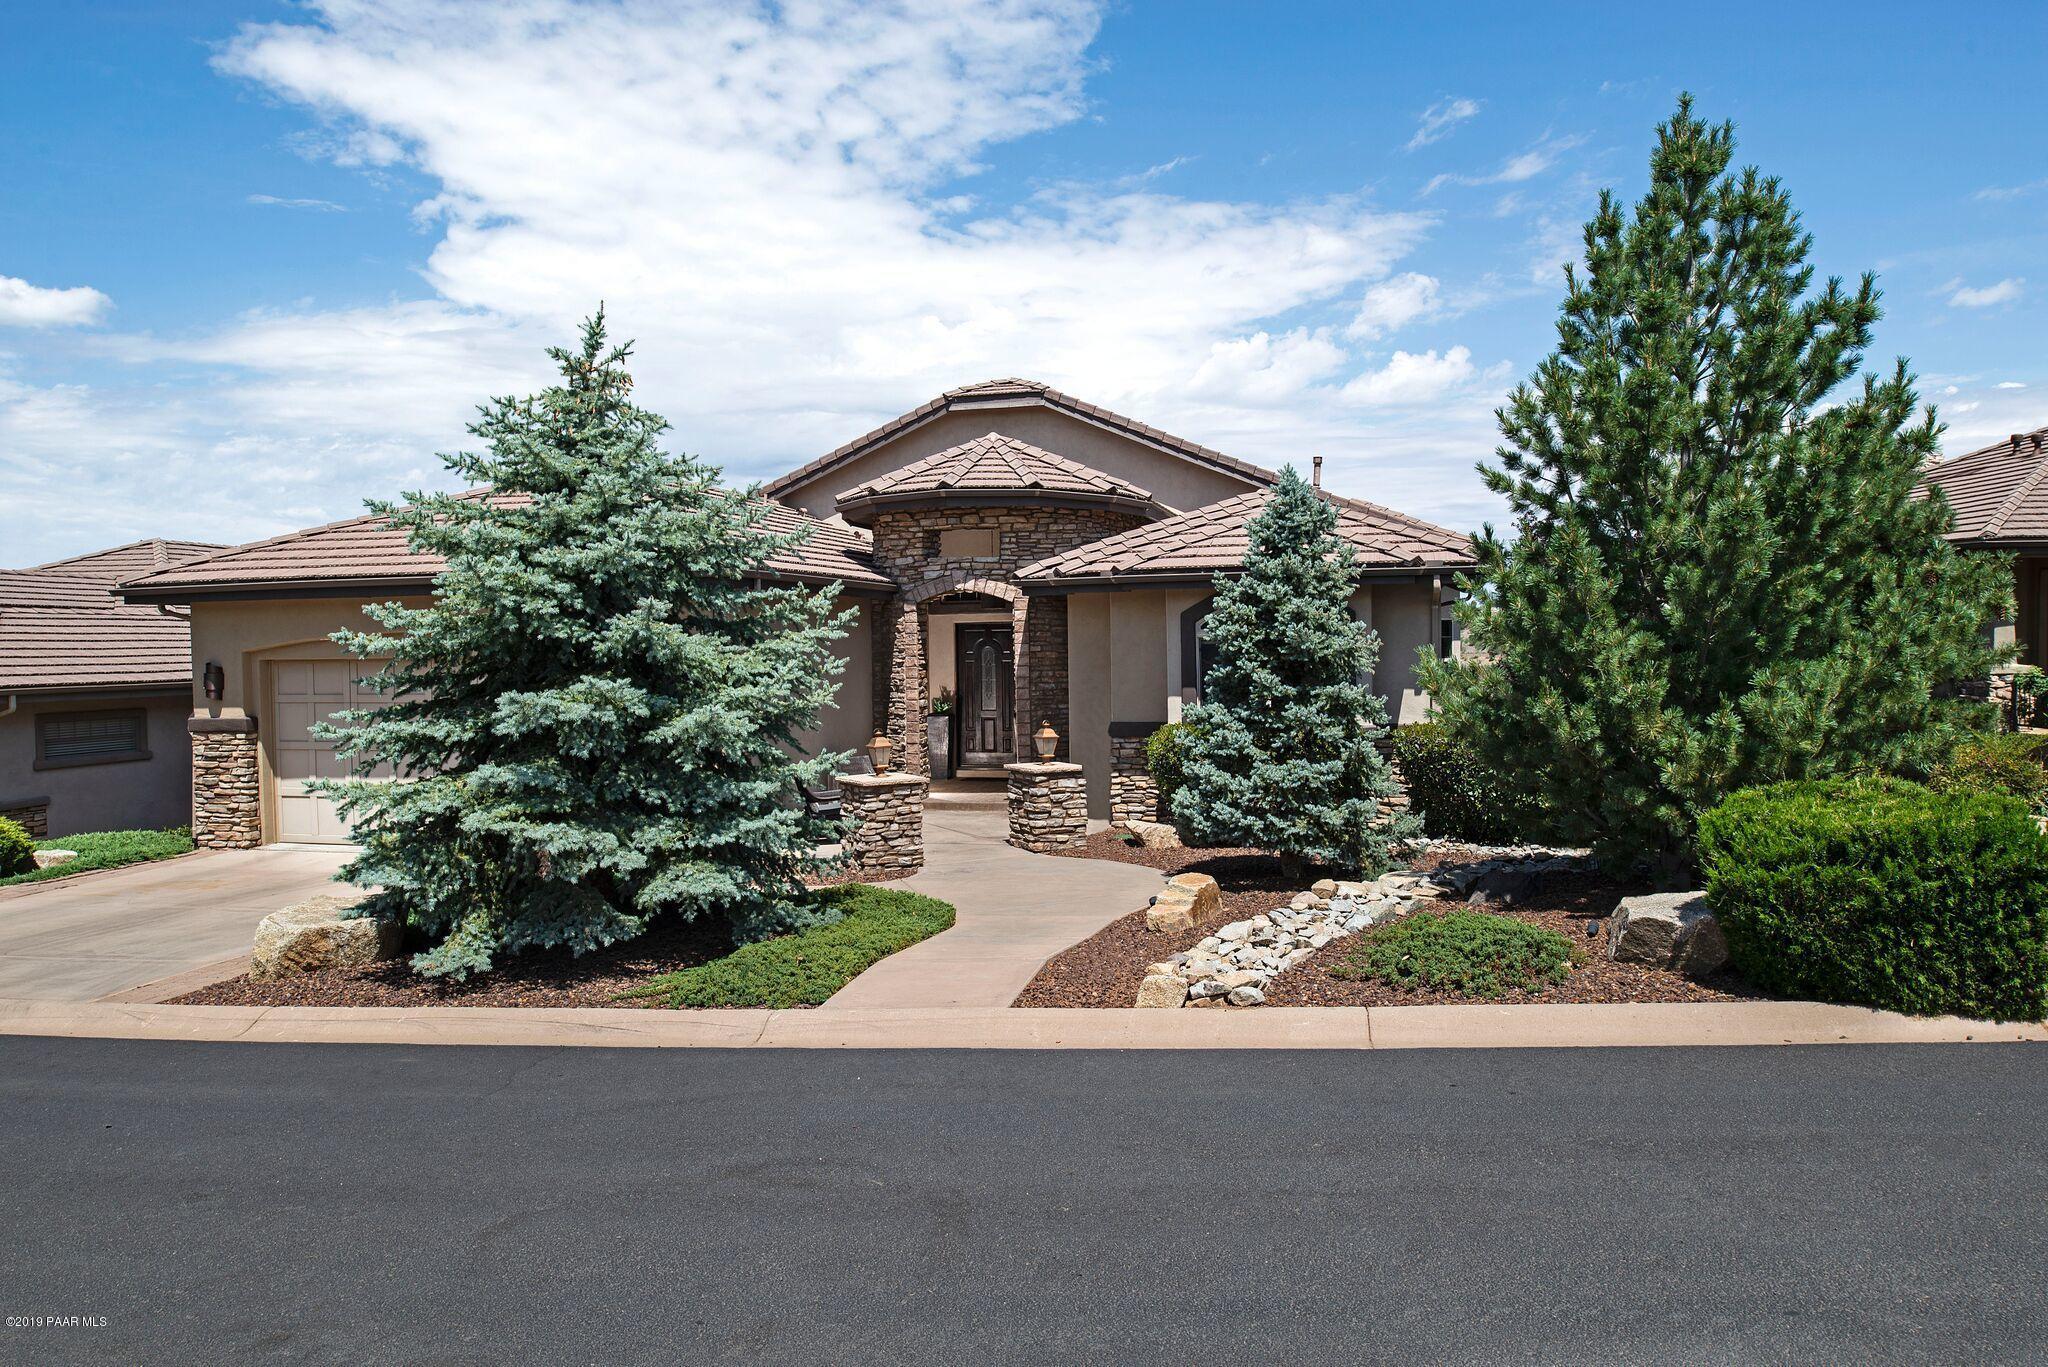 Photo of 1262 Pebble Springs, Prescott, AZ 86301